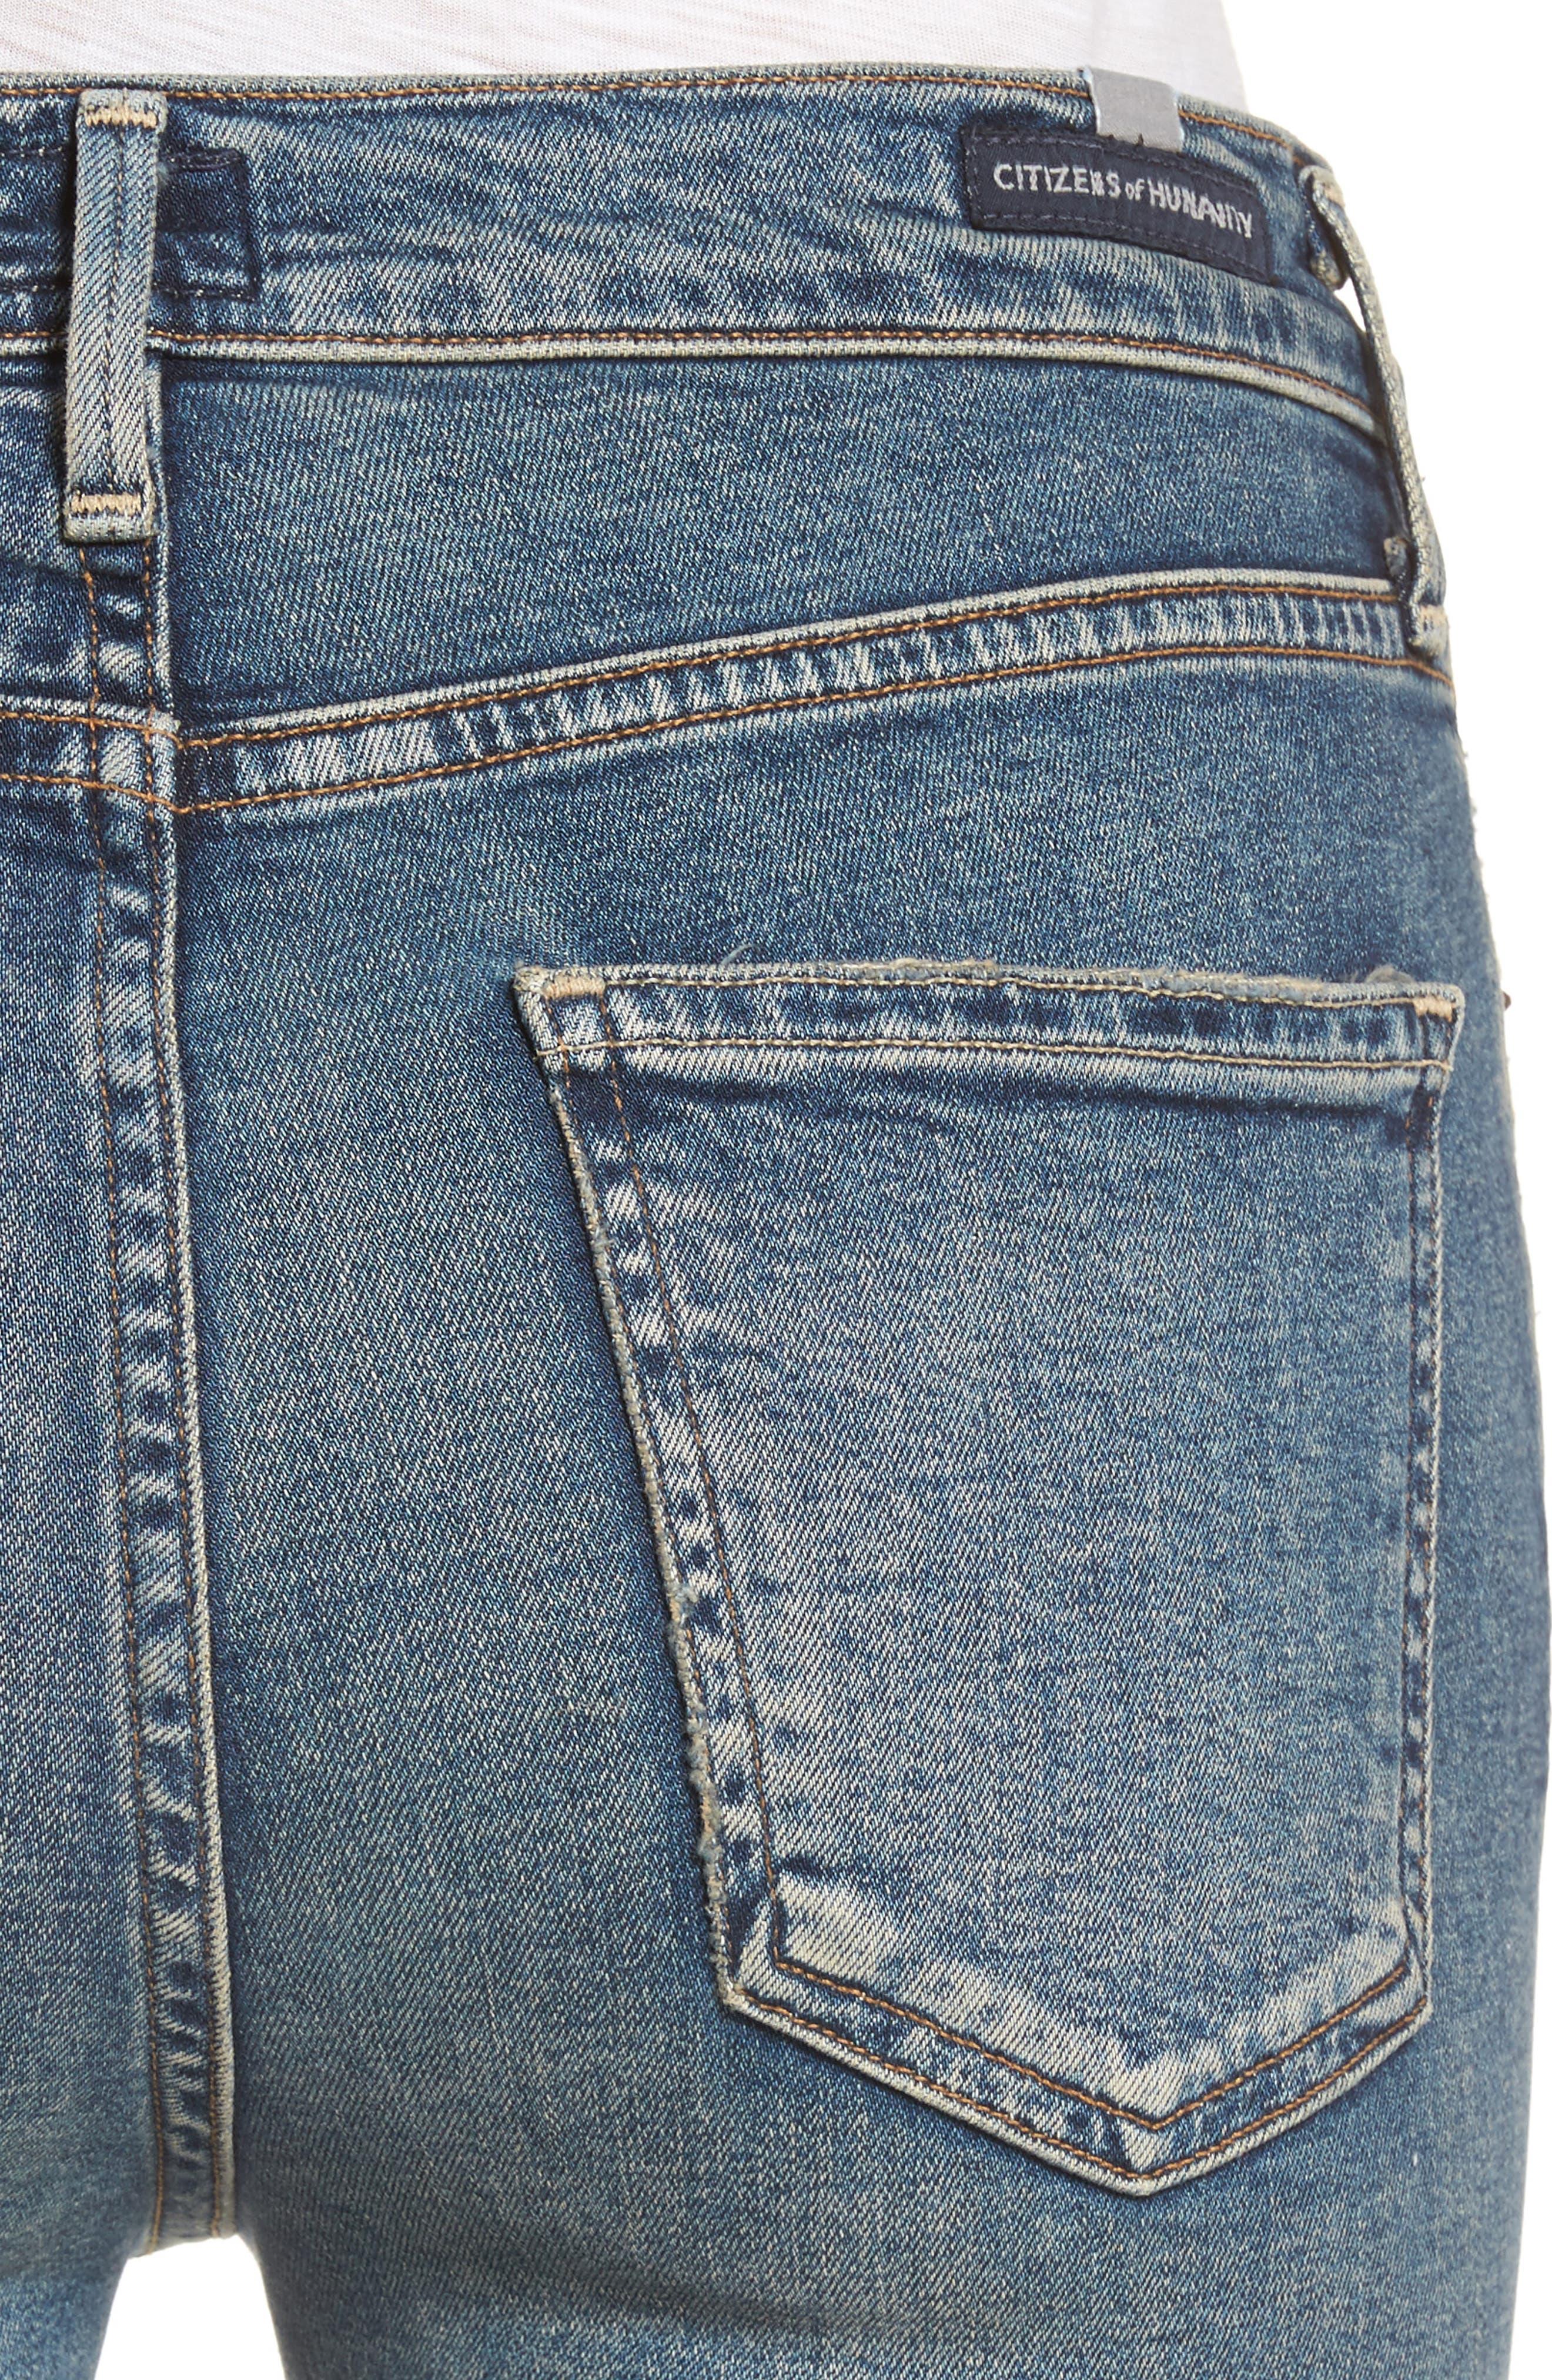 Rocket Crop Skinny Jeans,                             Alternate thumbnail 4, color,                             405